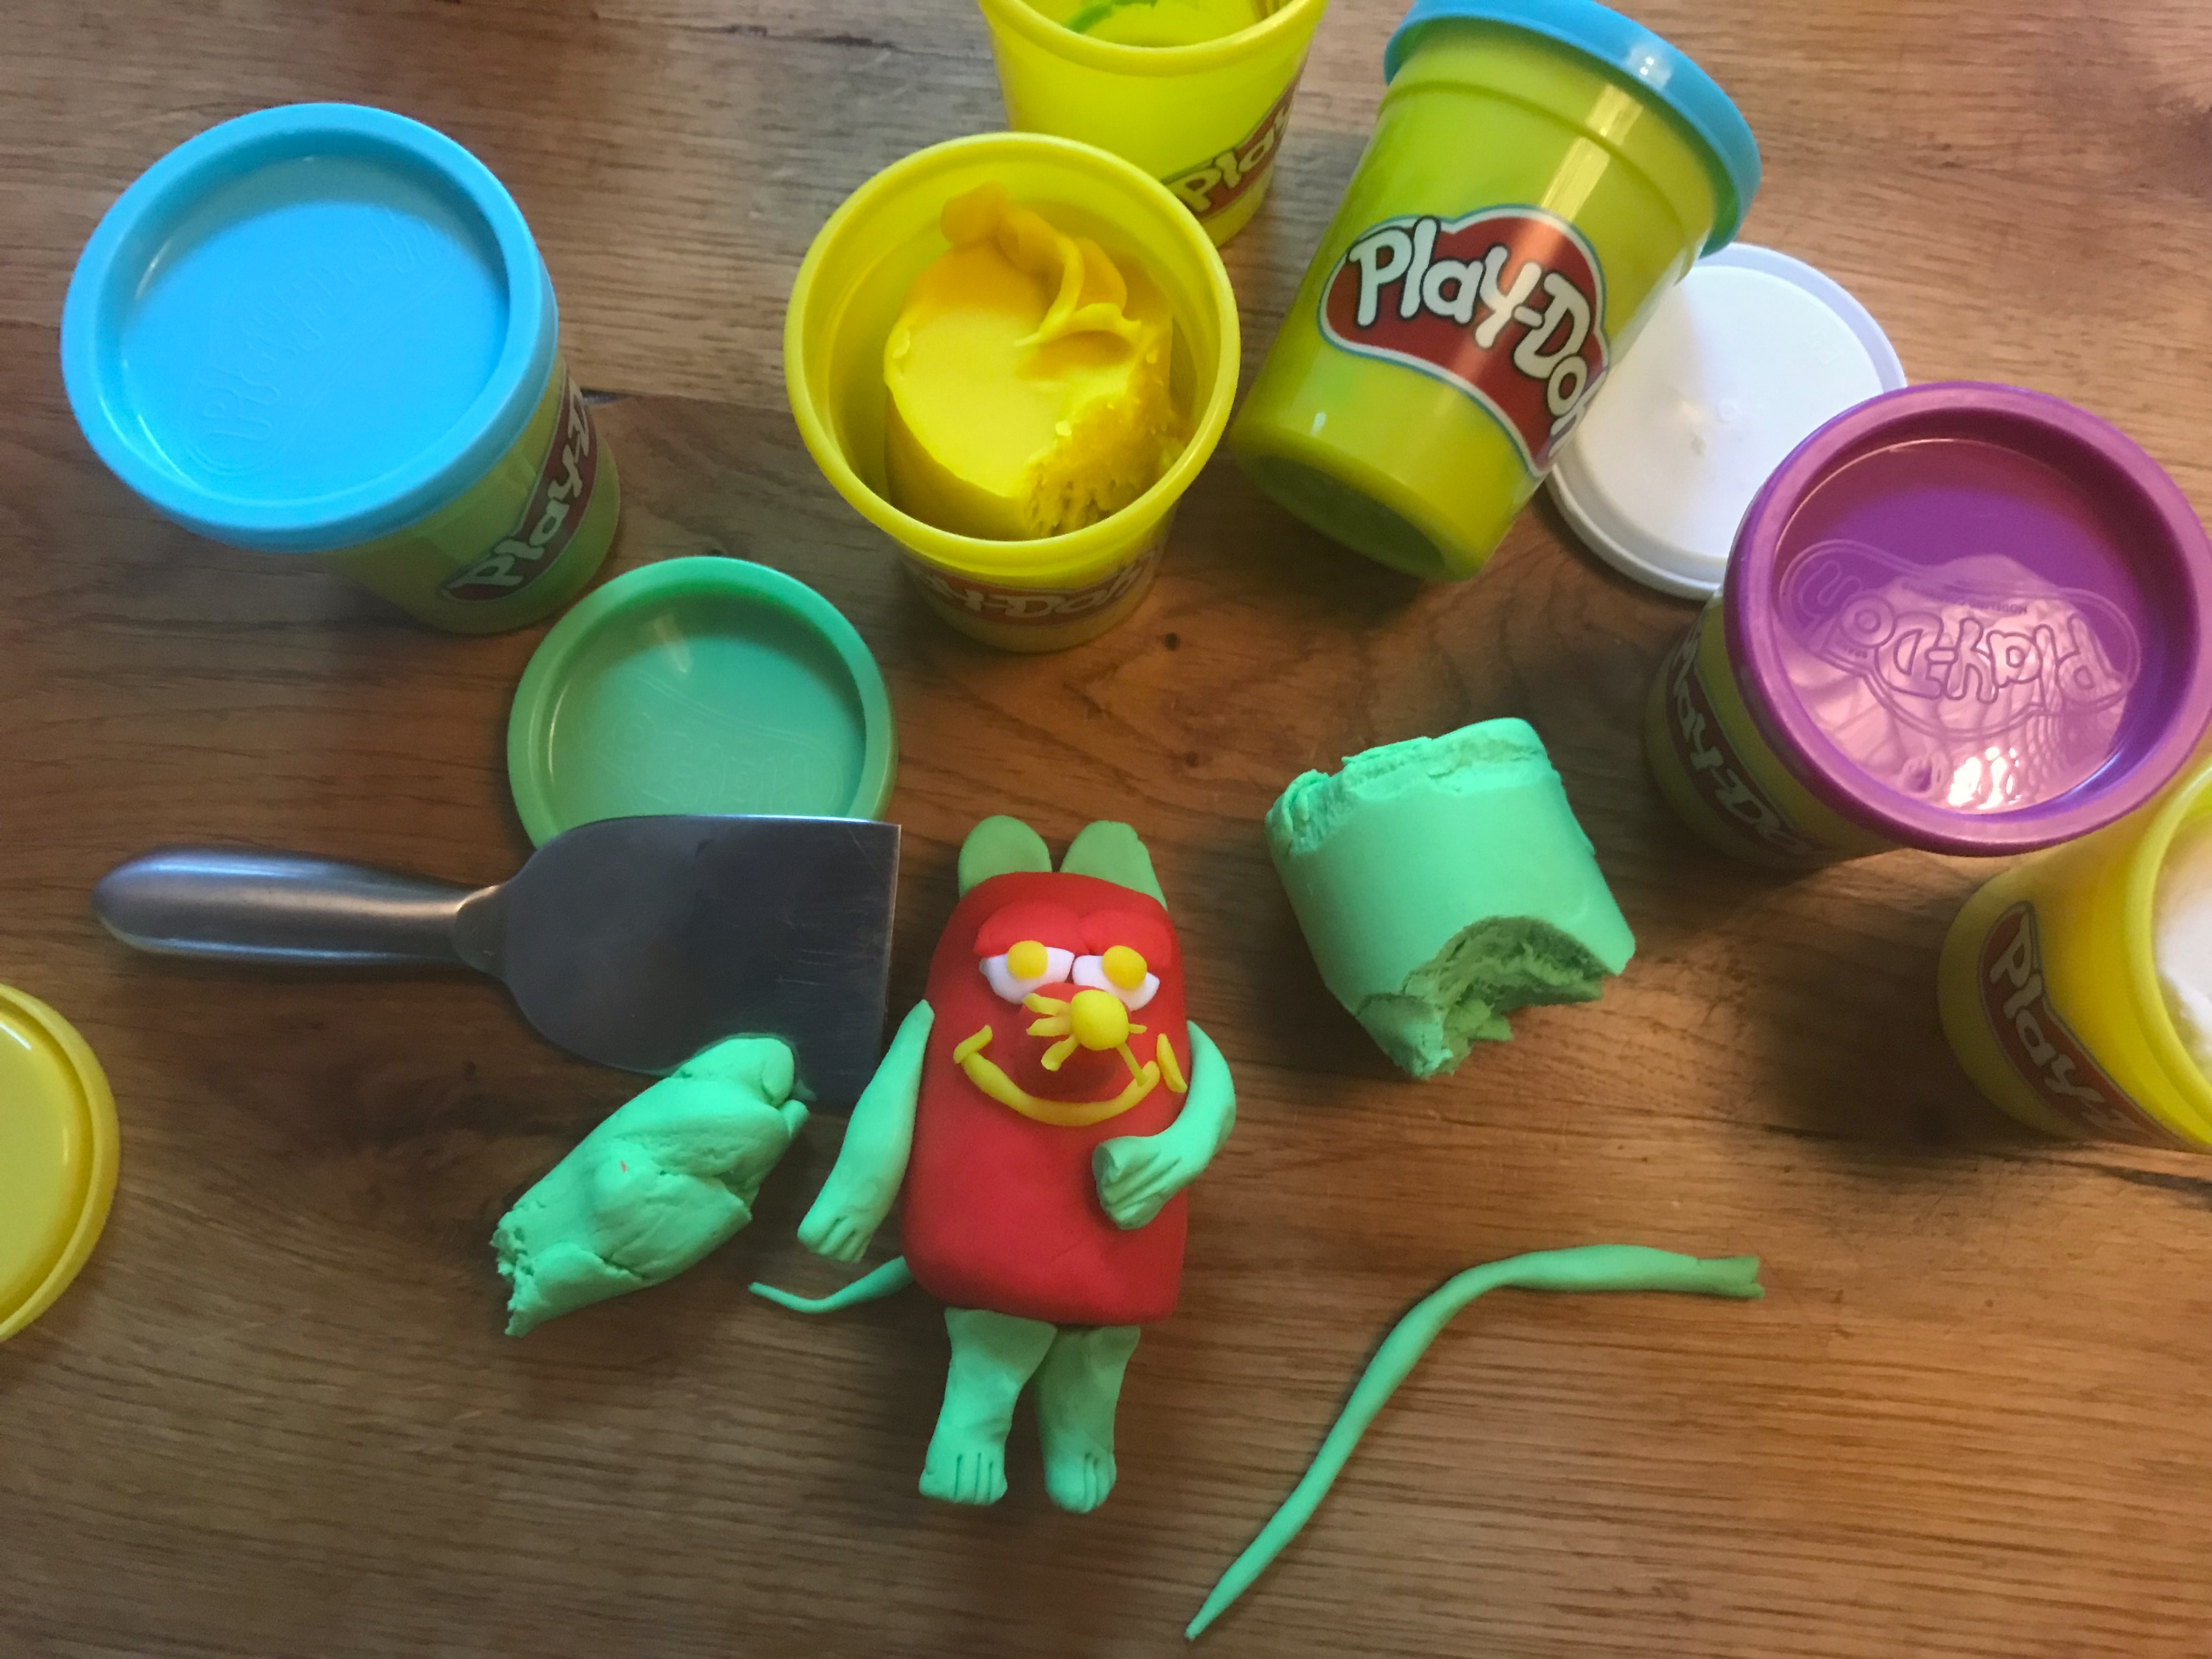 Play Doh DADDYlicious 3